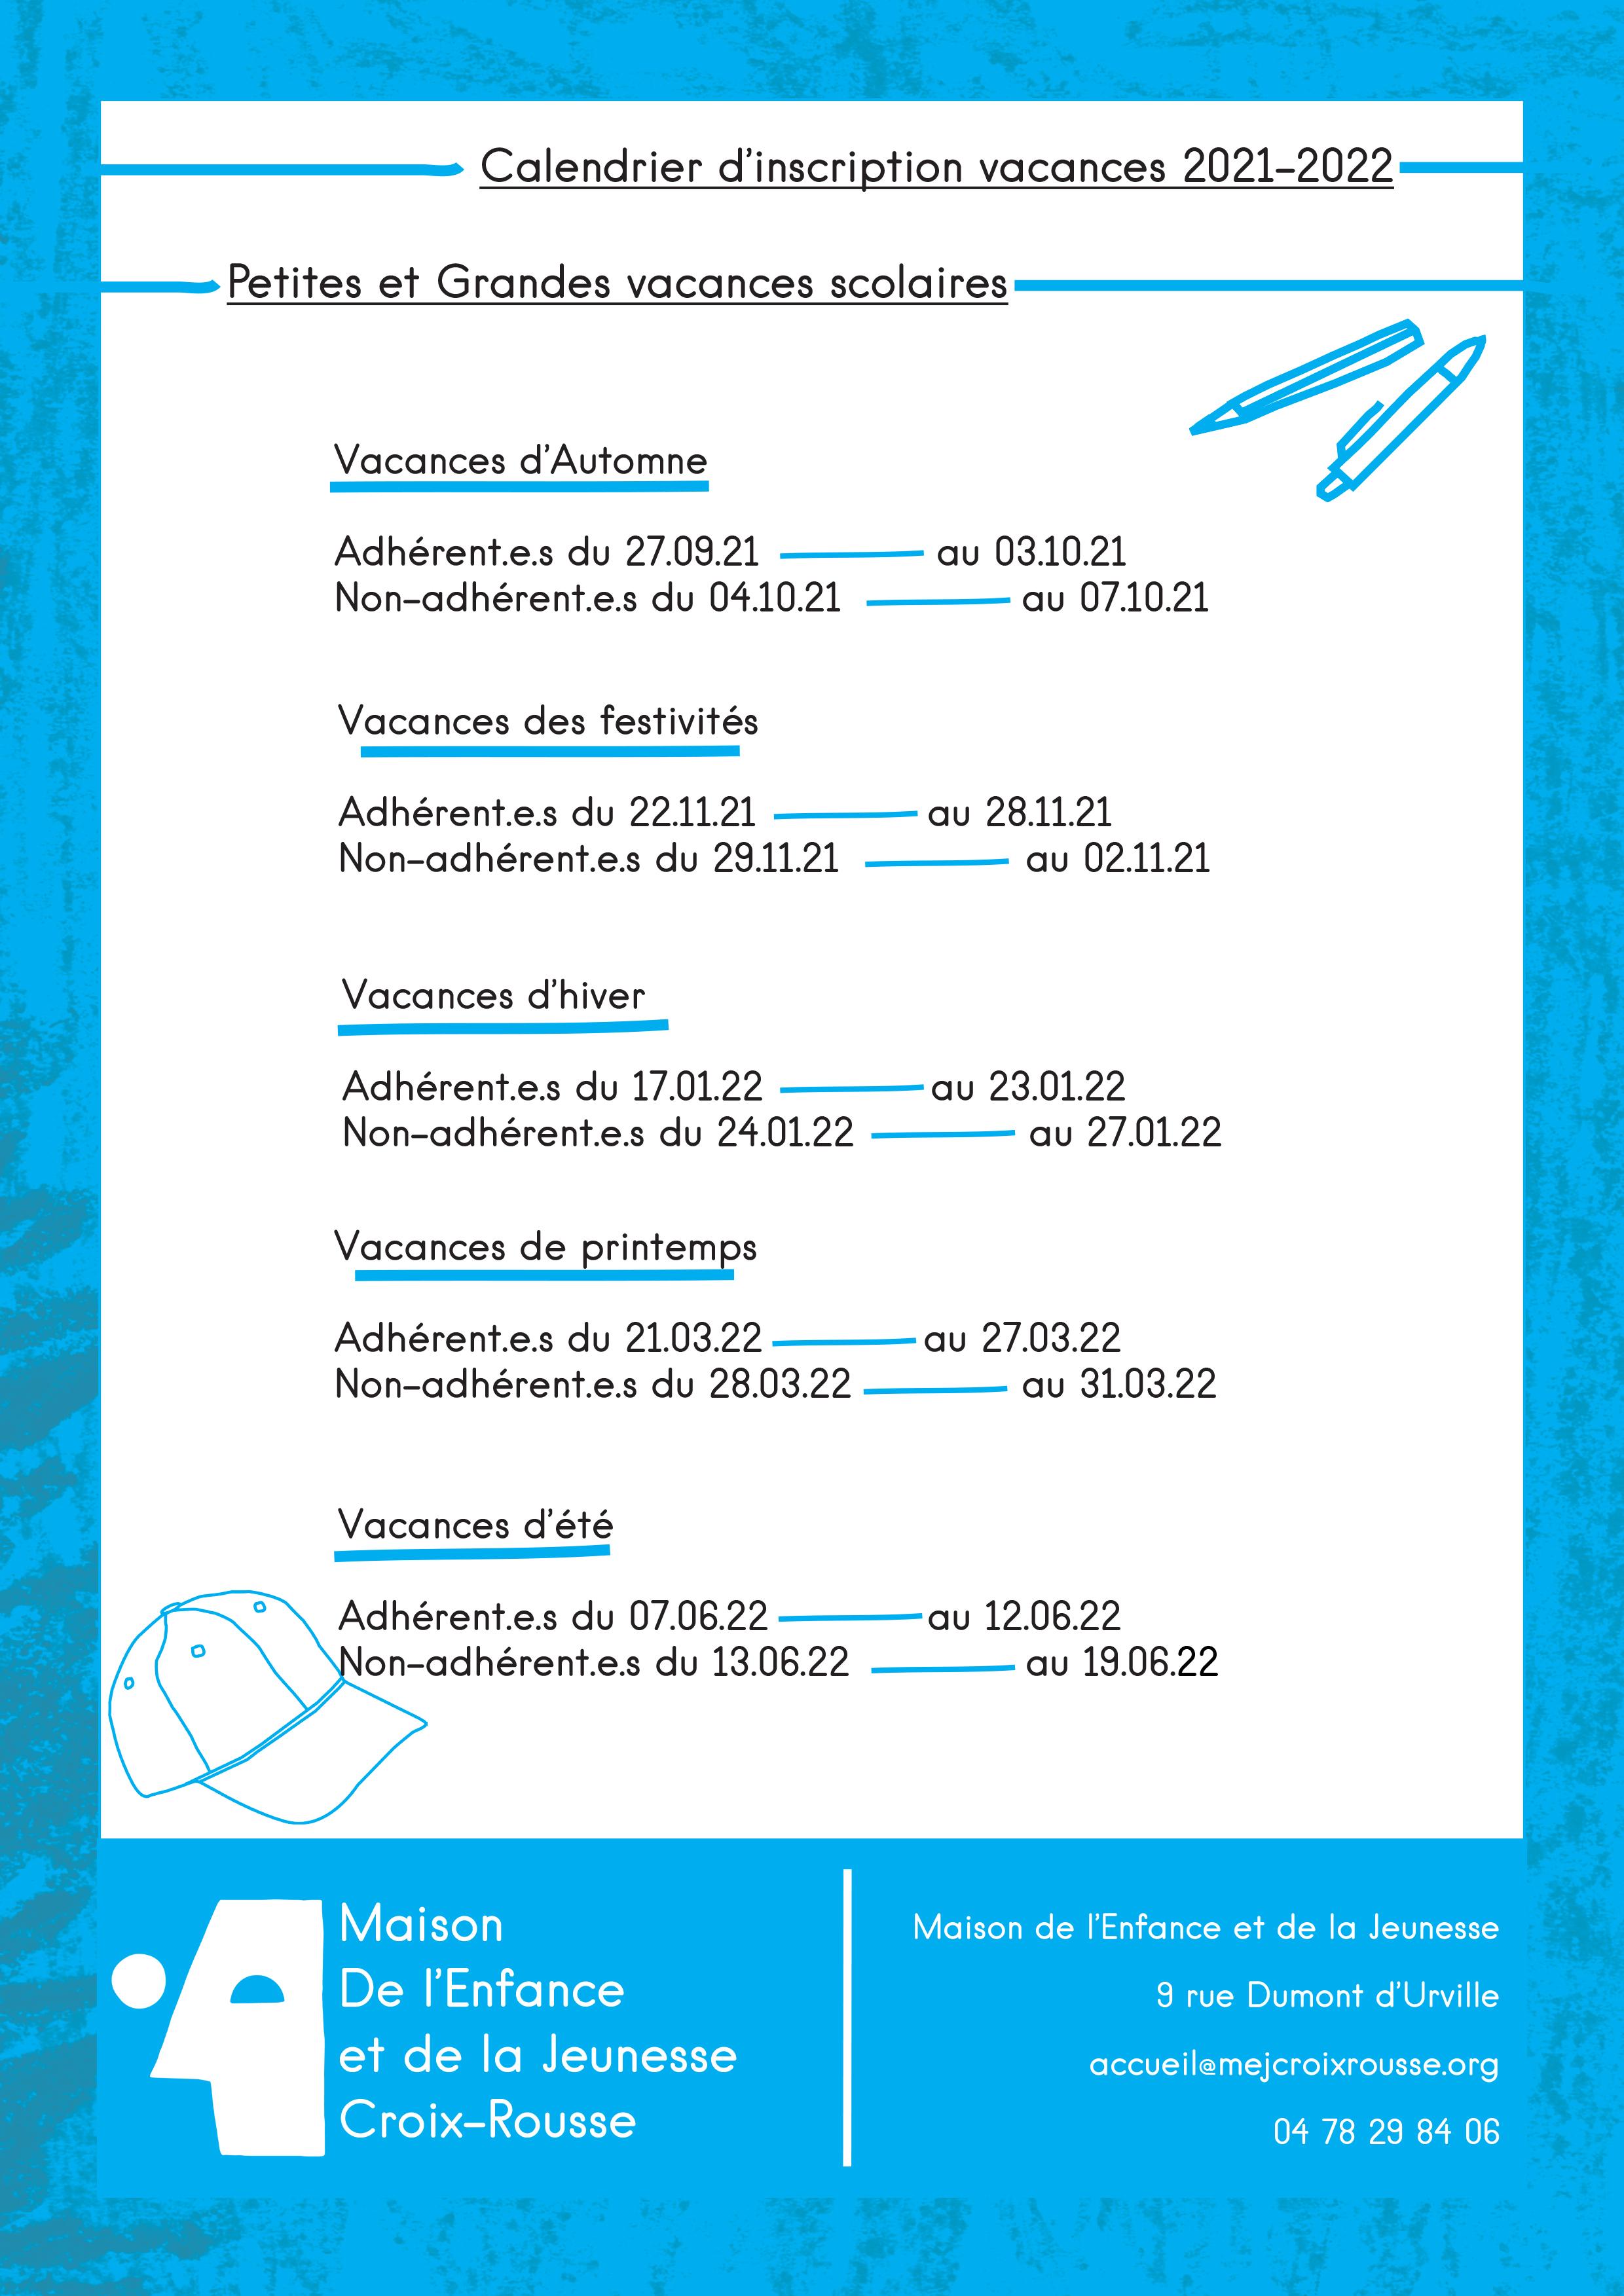 Calendrier inscription Vacances 2021-2022